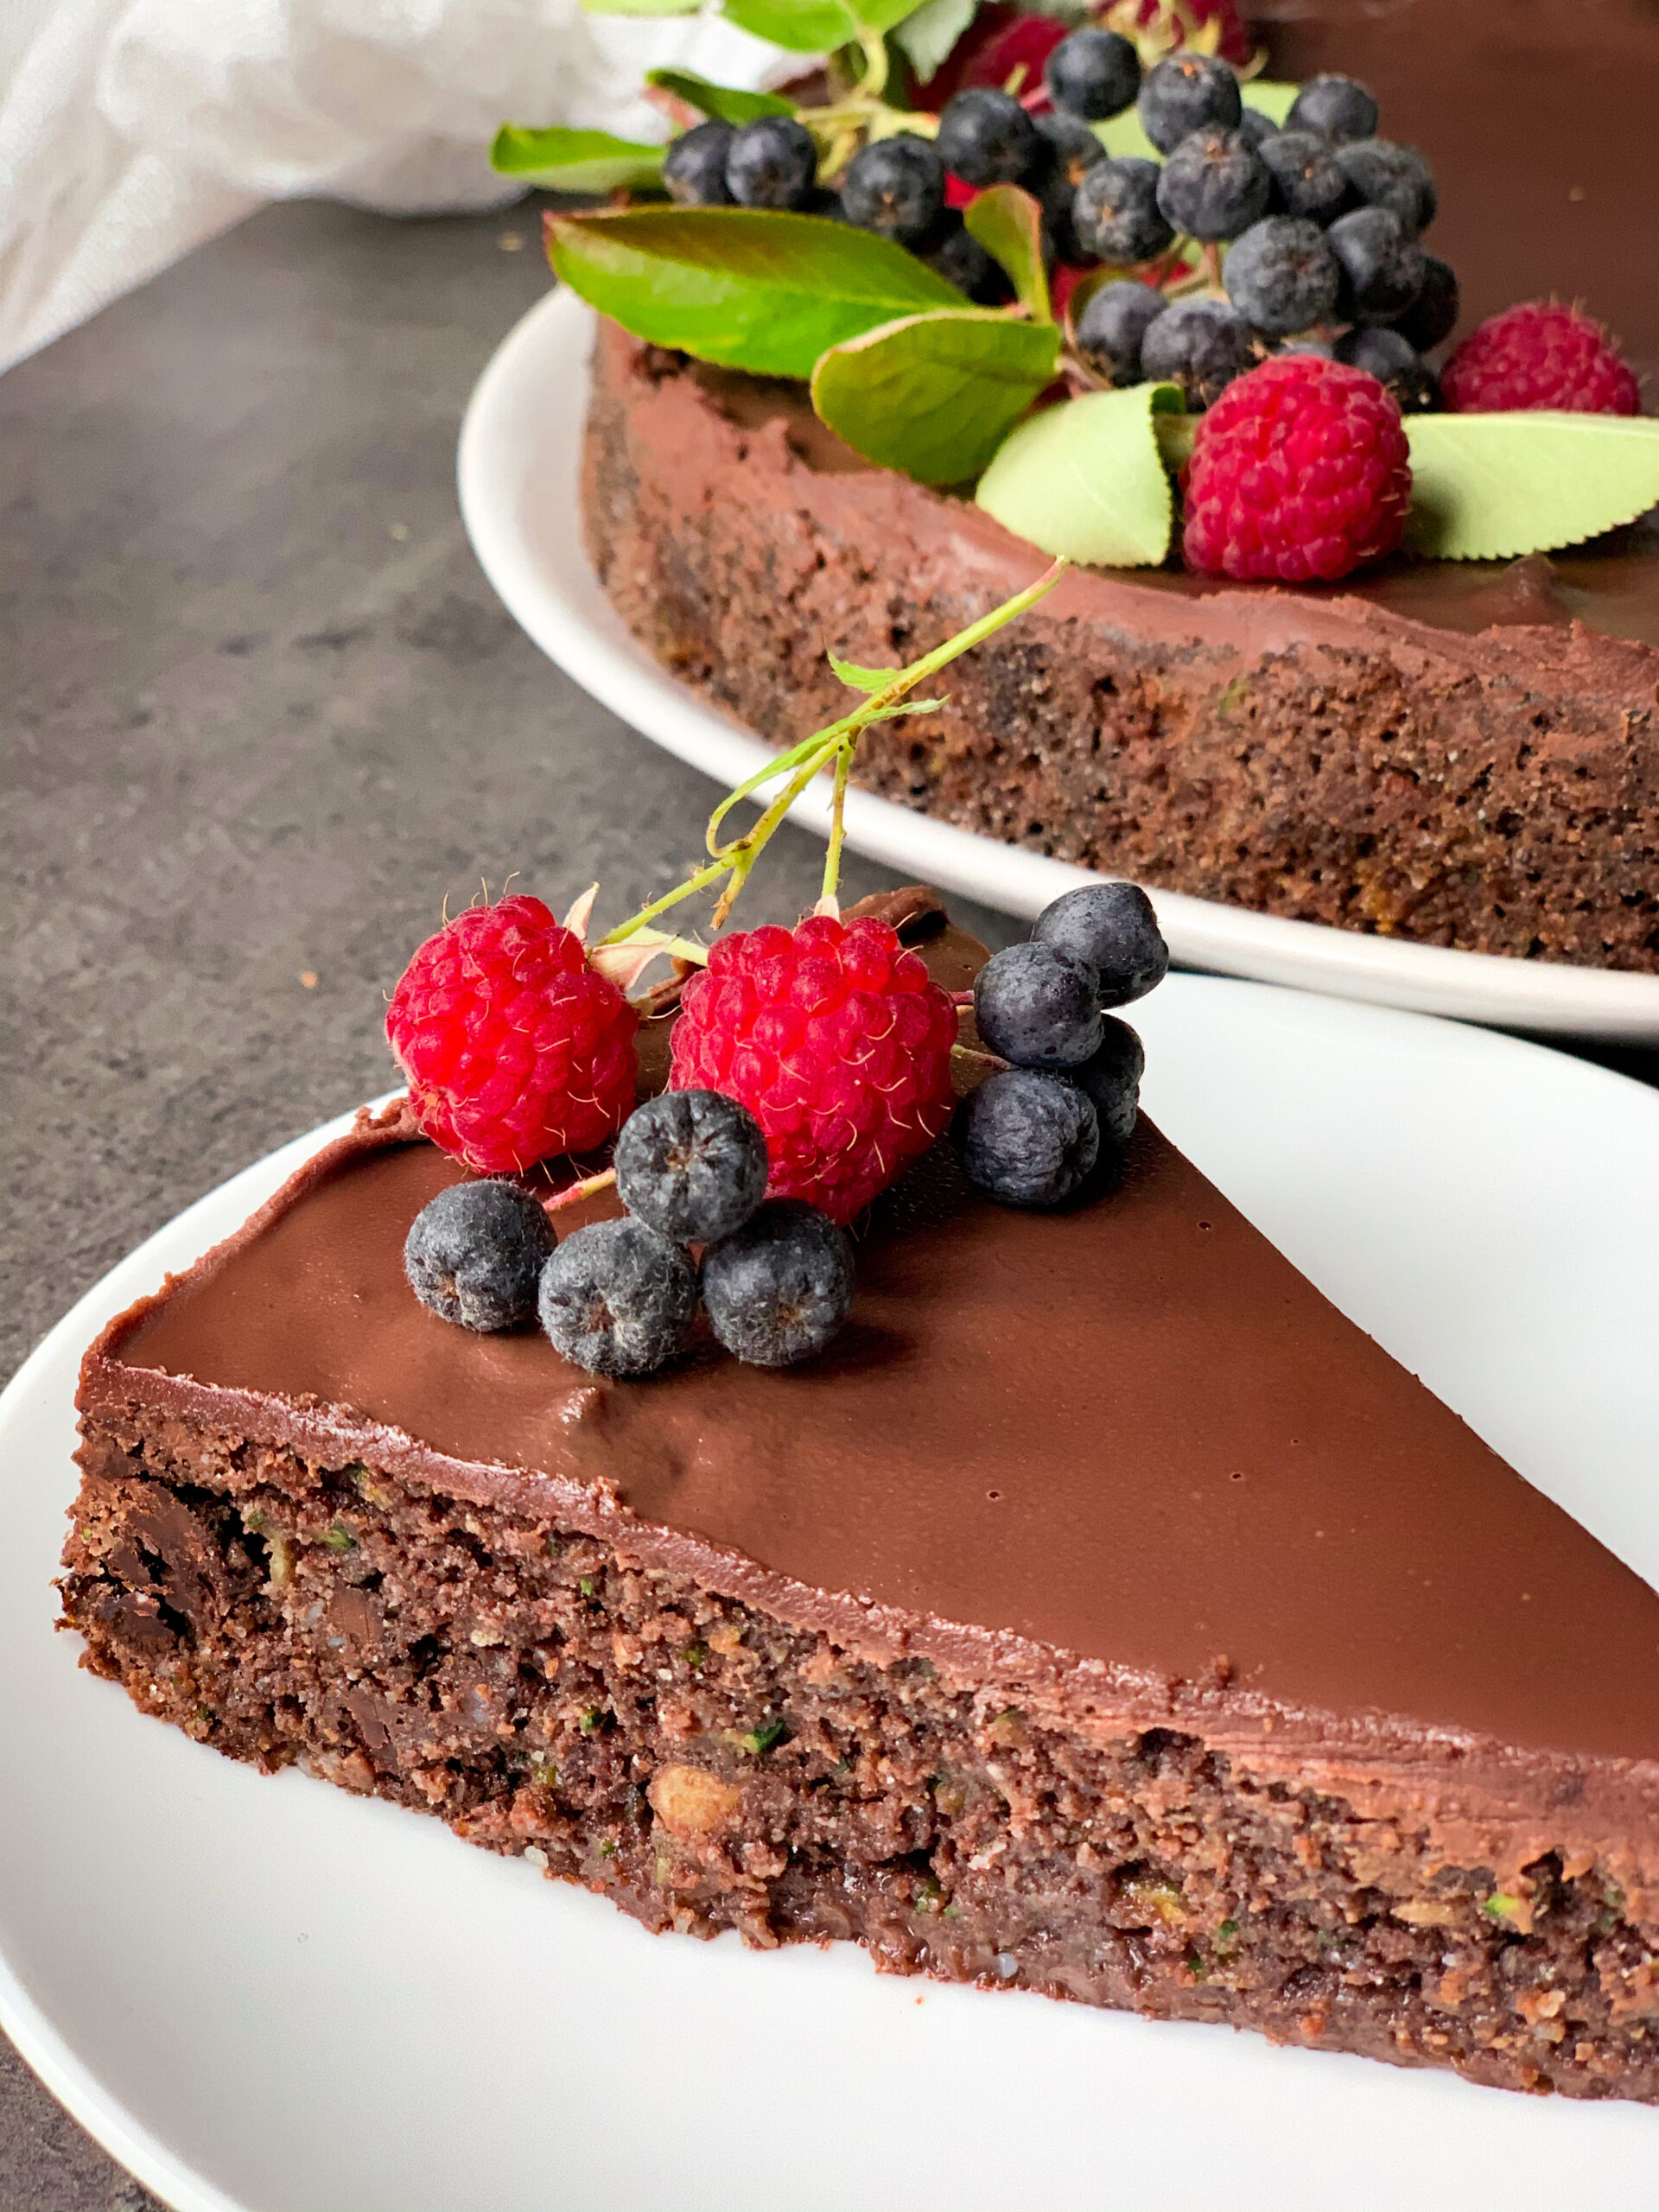 Keto chocolate zucchini cake with walnuts